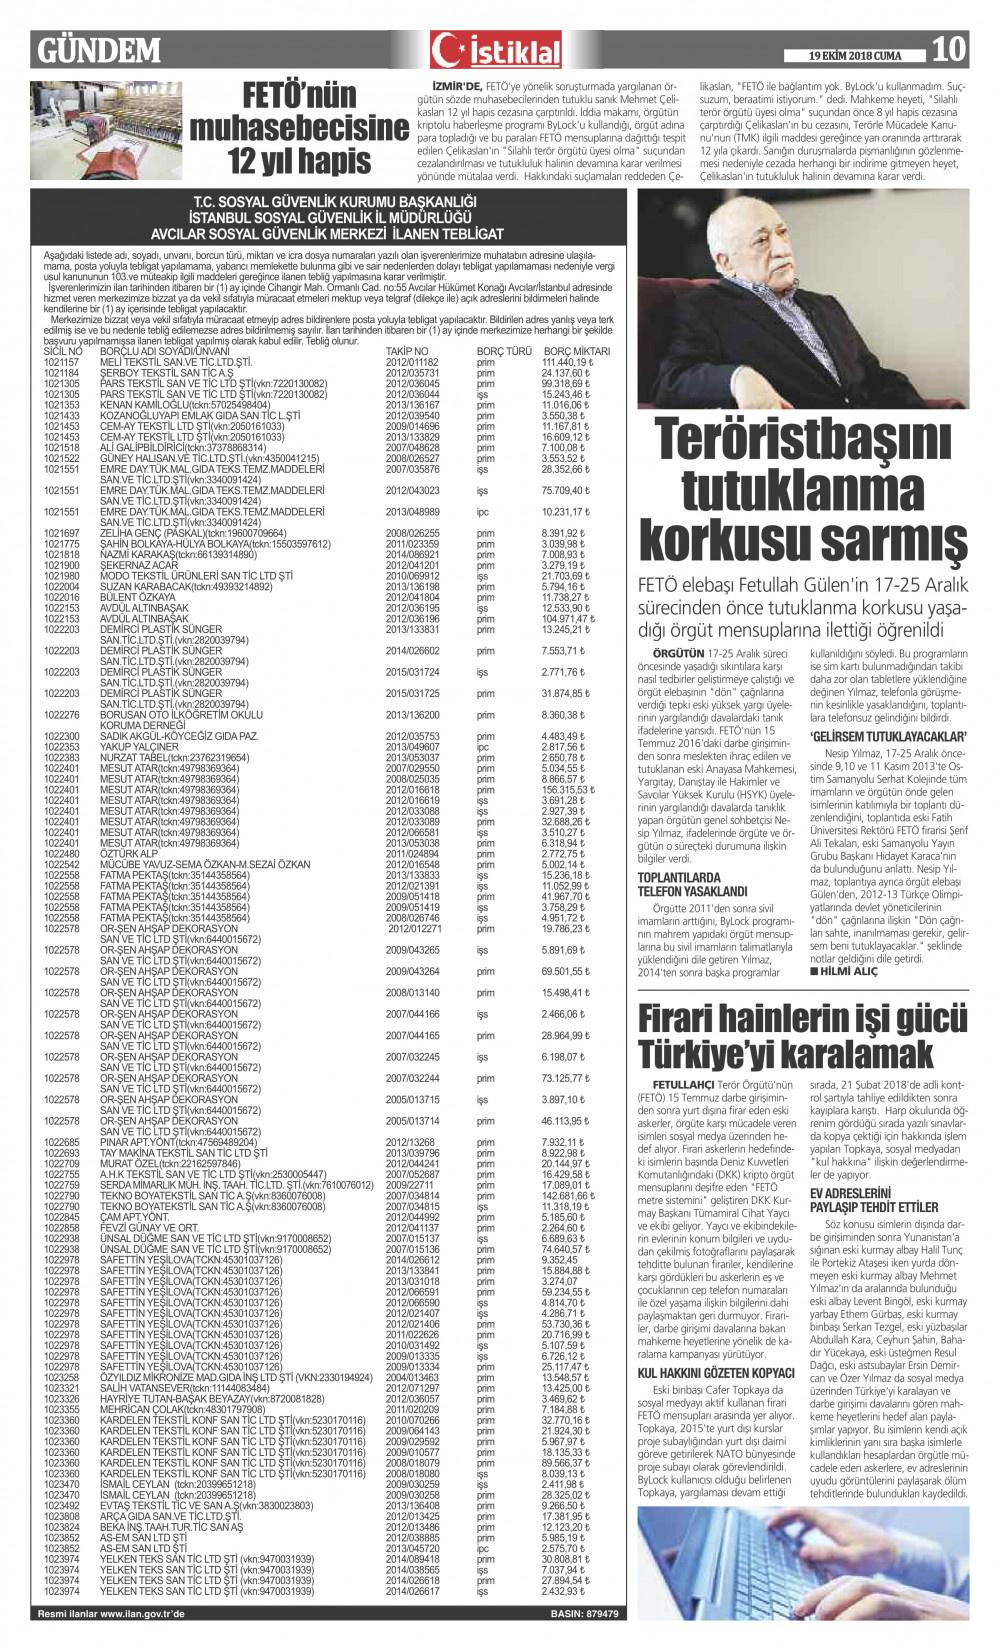 İstiklal Gazetesi 10'nci Sayfa